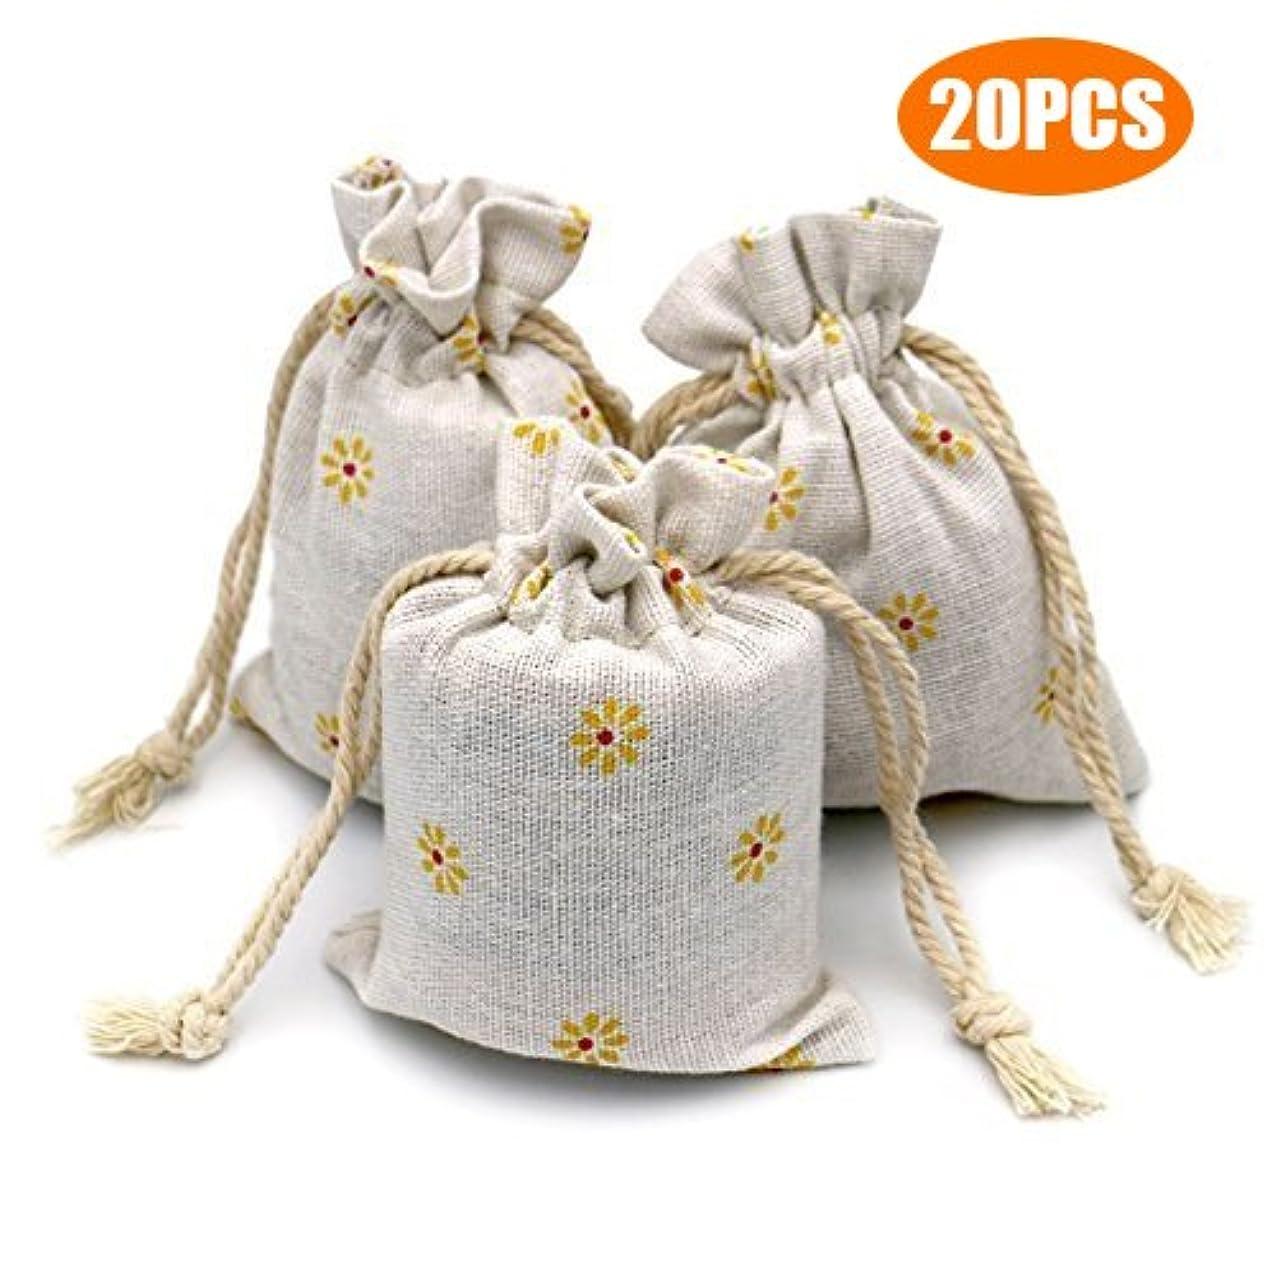 G2PLUS 20 PCS Cotton Burlap Drawstring Pouches Gift Bags Wedding Party Favor Jewelry Bags 3.5'' x 4.7'' (Yellow Daisy) lixagsgkzwtyc478